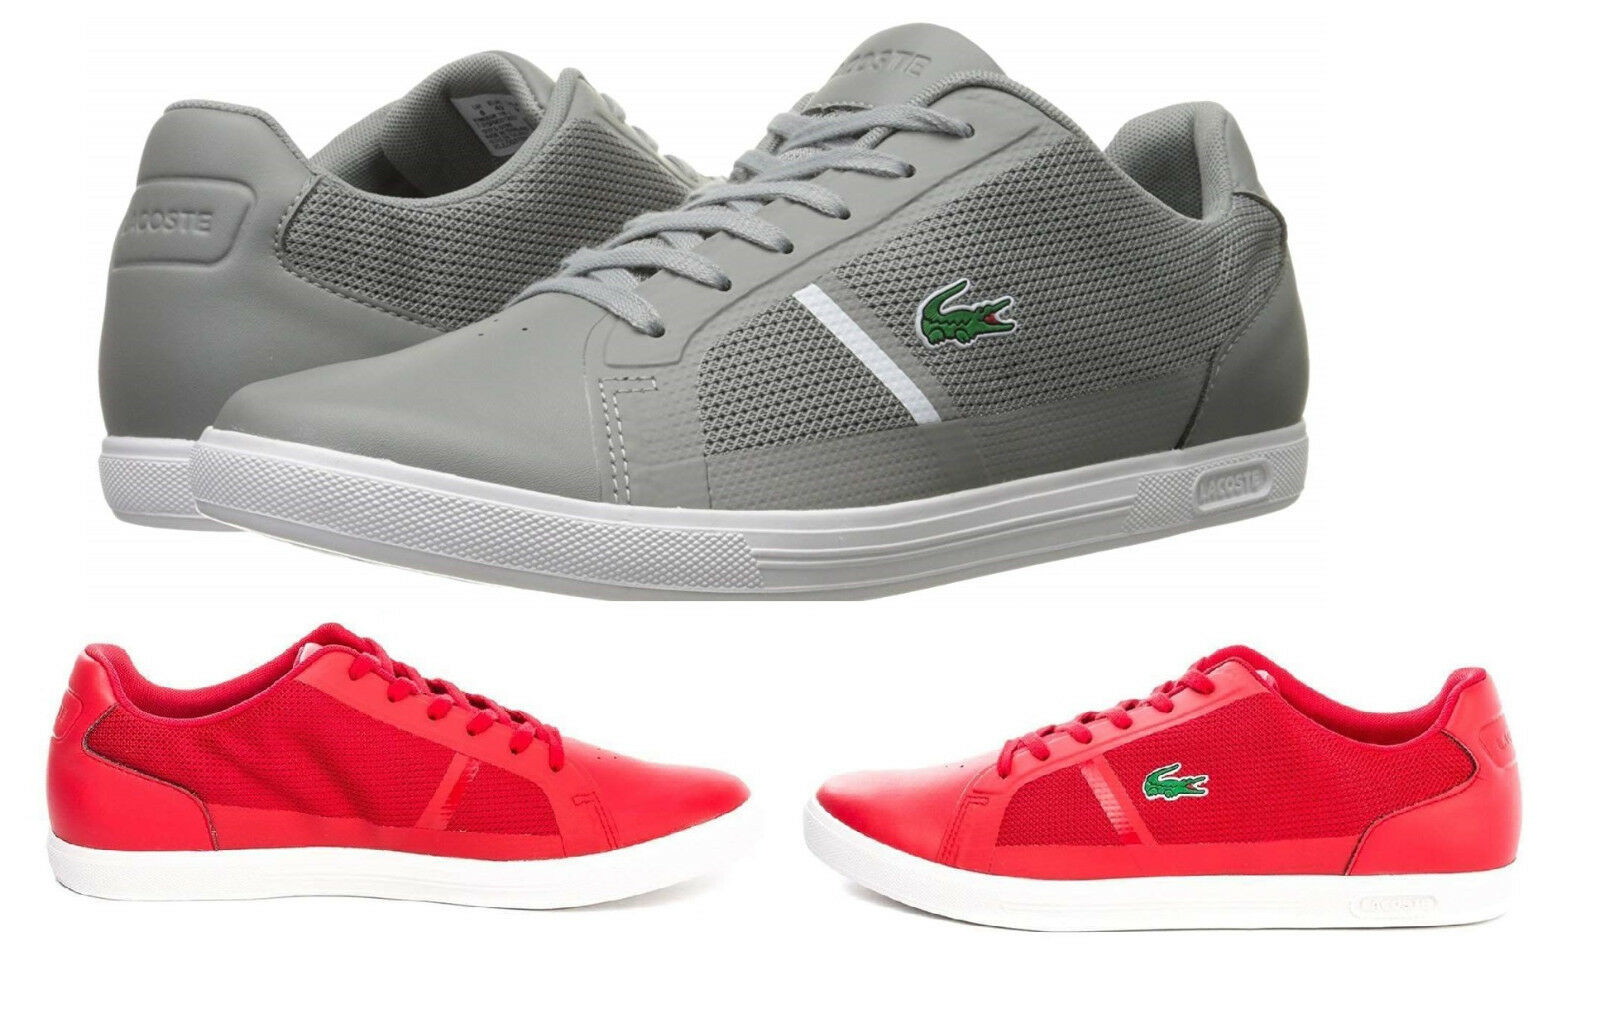 NEW Lacoste Men's Strideur Comfort Sneakers Casual shoes